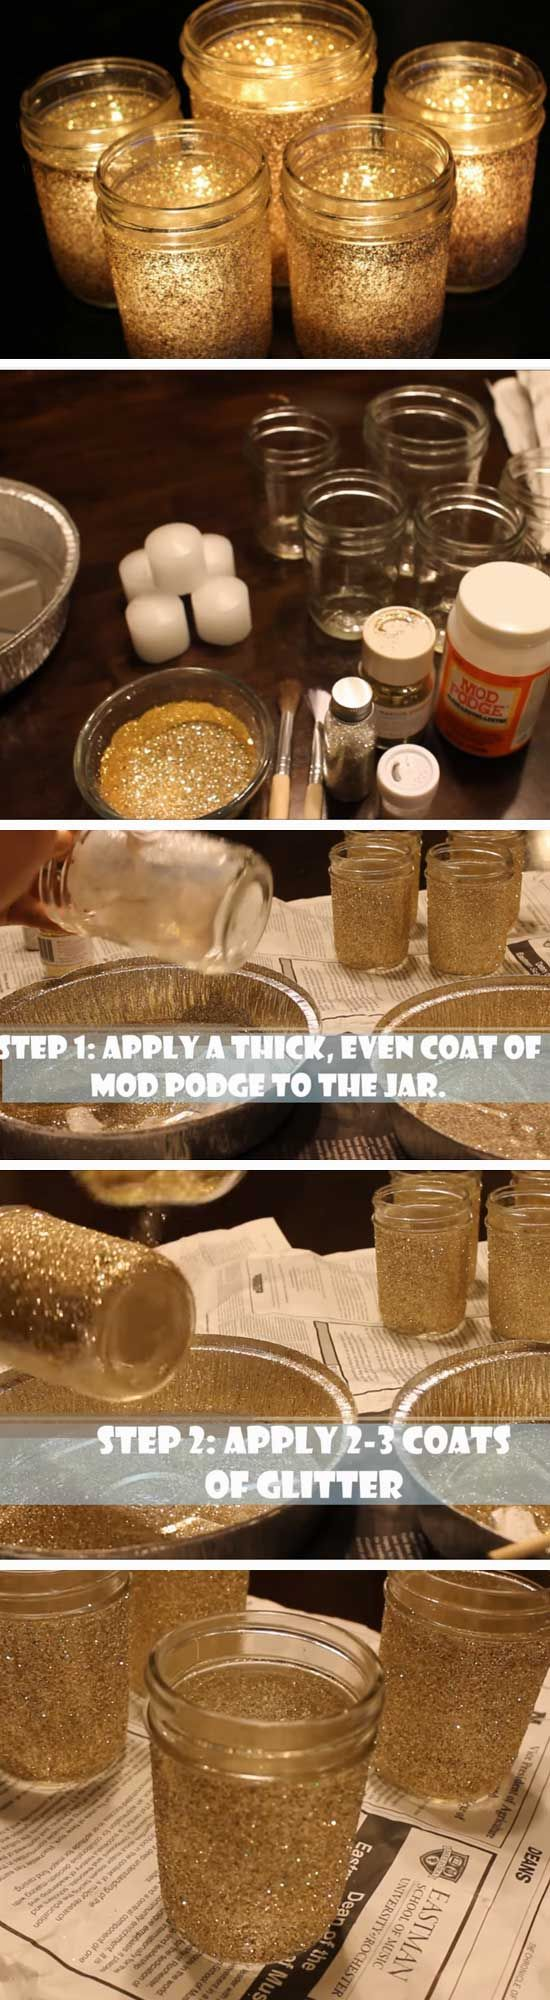 Christmas Party Craft Ideas For Adults Part - 35: Ten Inspirational DIY Mason Jar Ideas For Weddings   Gold Mason Jars, Mason  Jar Vases And Jar